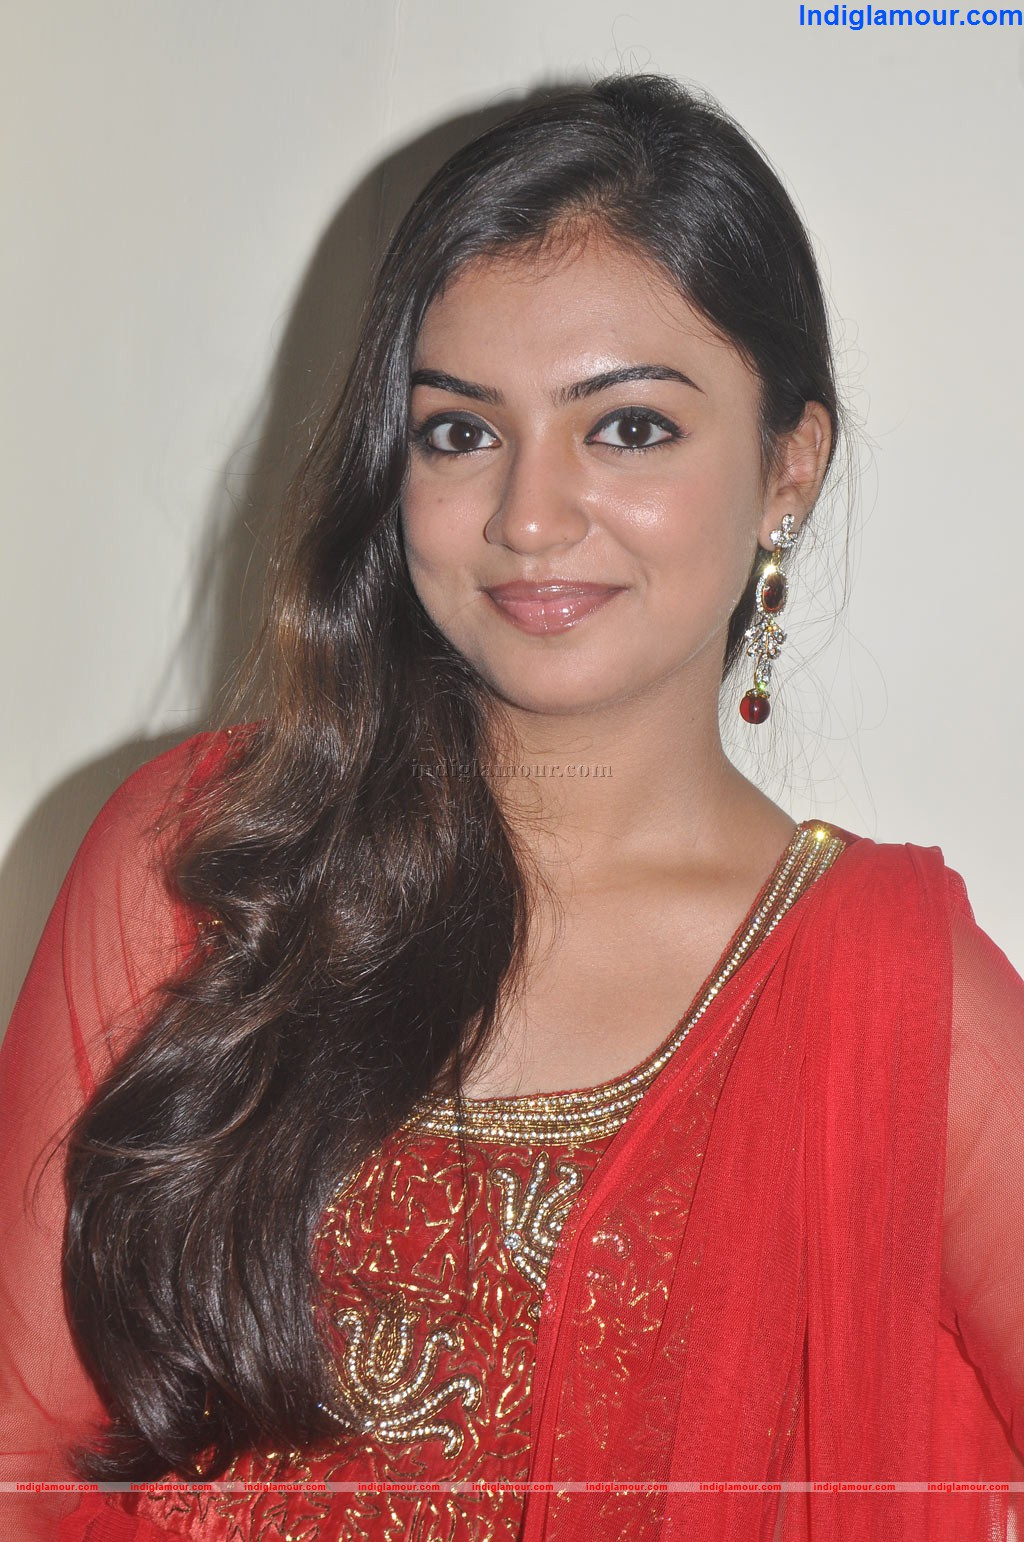 Nazriya Nazim Cute Photos: .: Nazriya Nazim Spicy Pics In Red Churidar